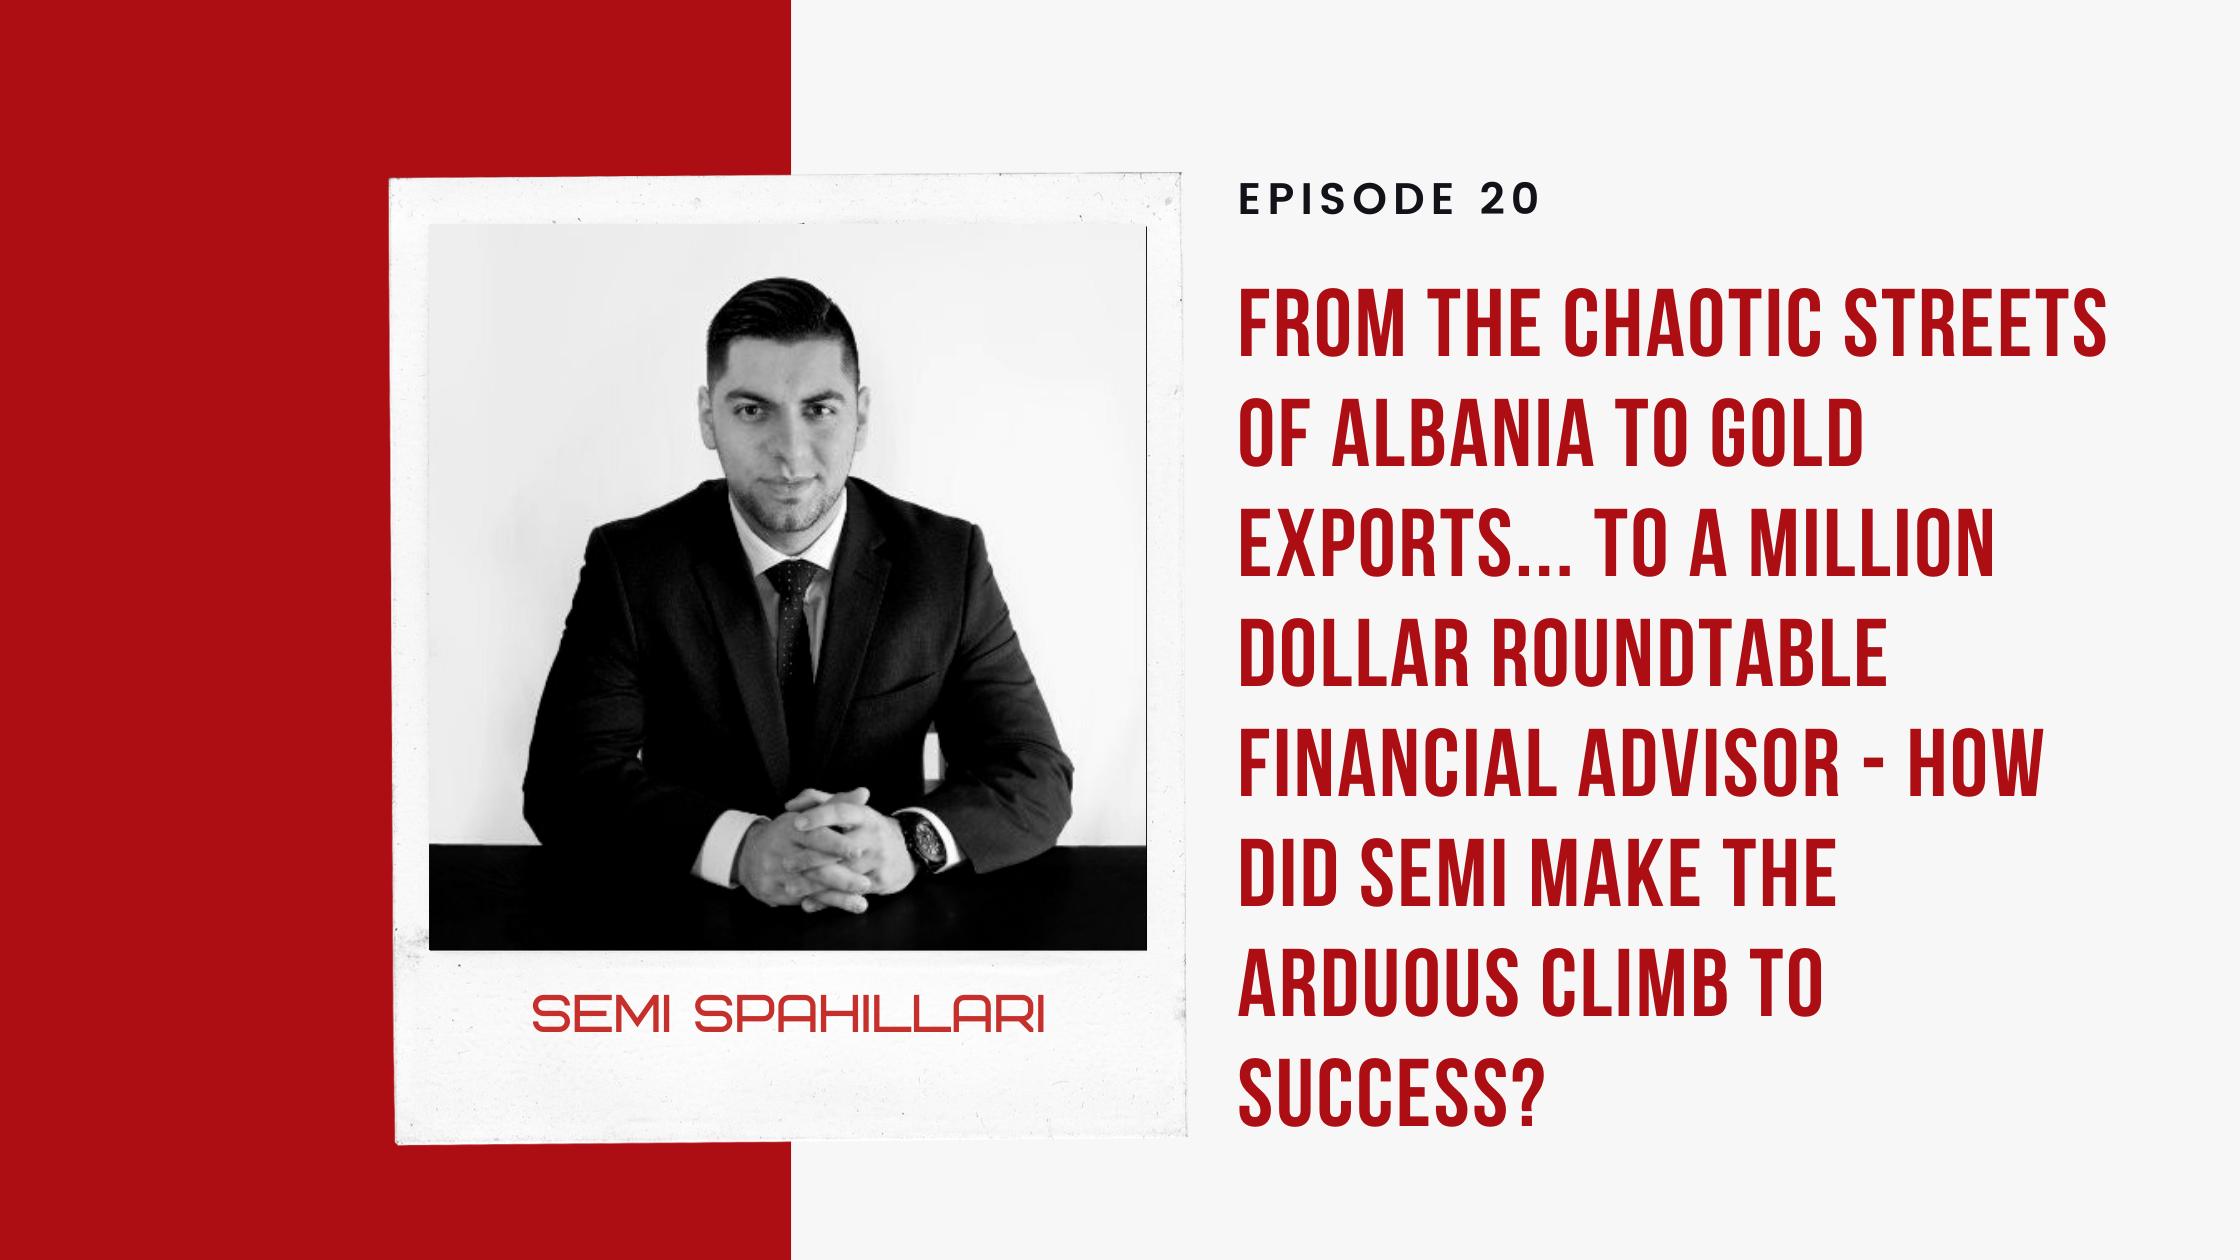 Financial Advisor - Semi Spahillari